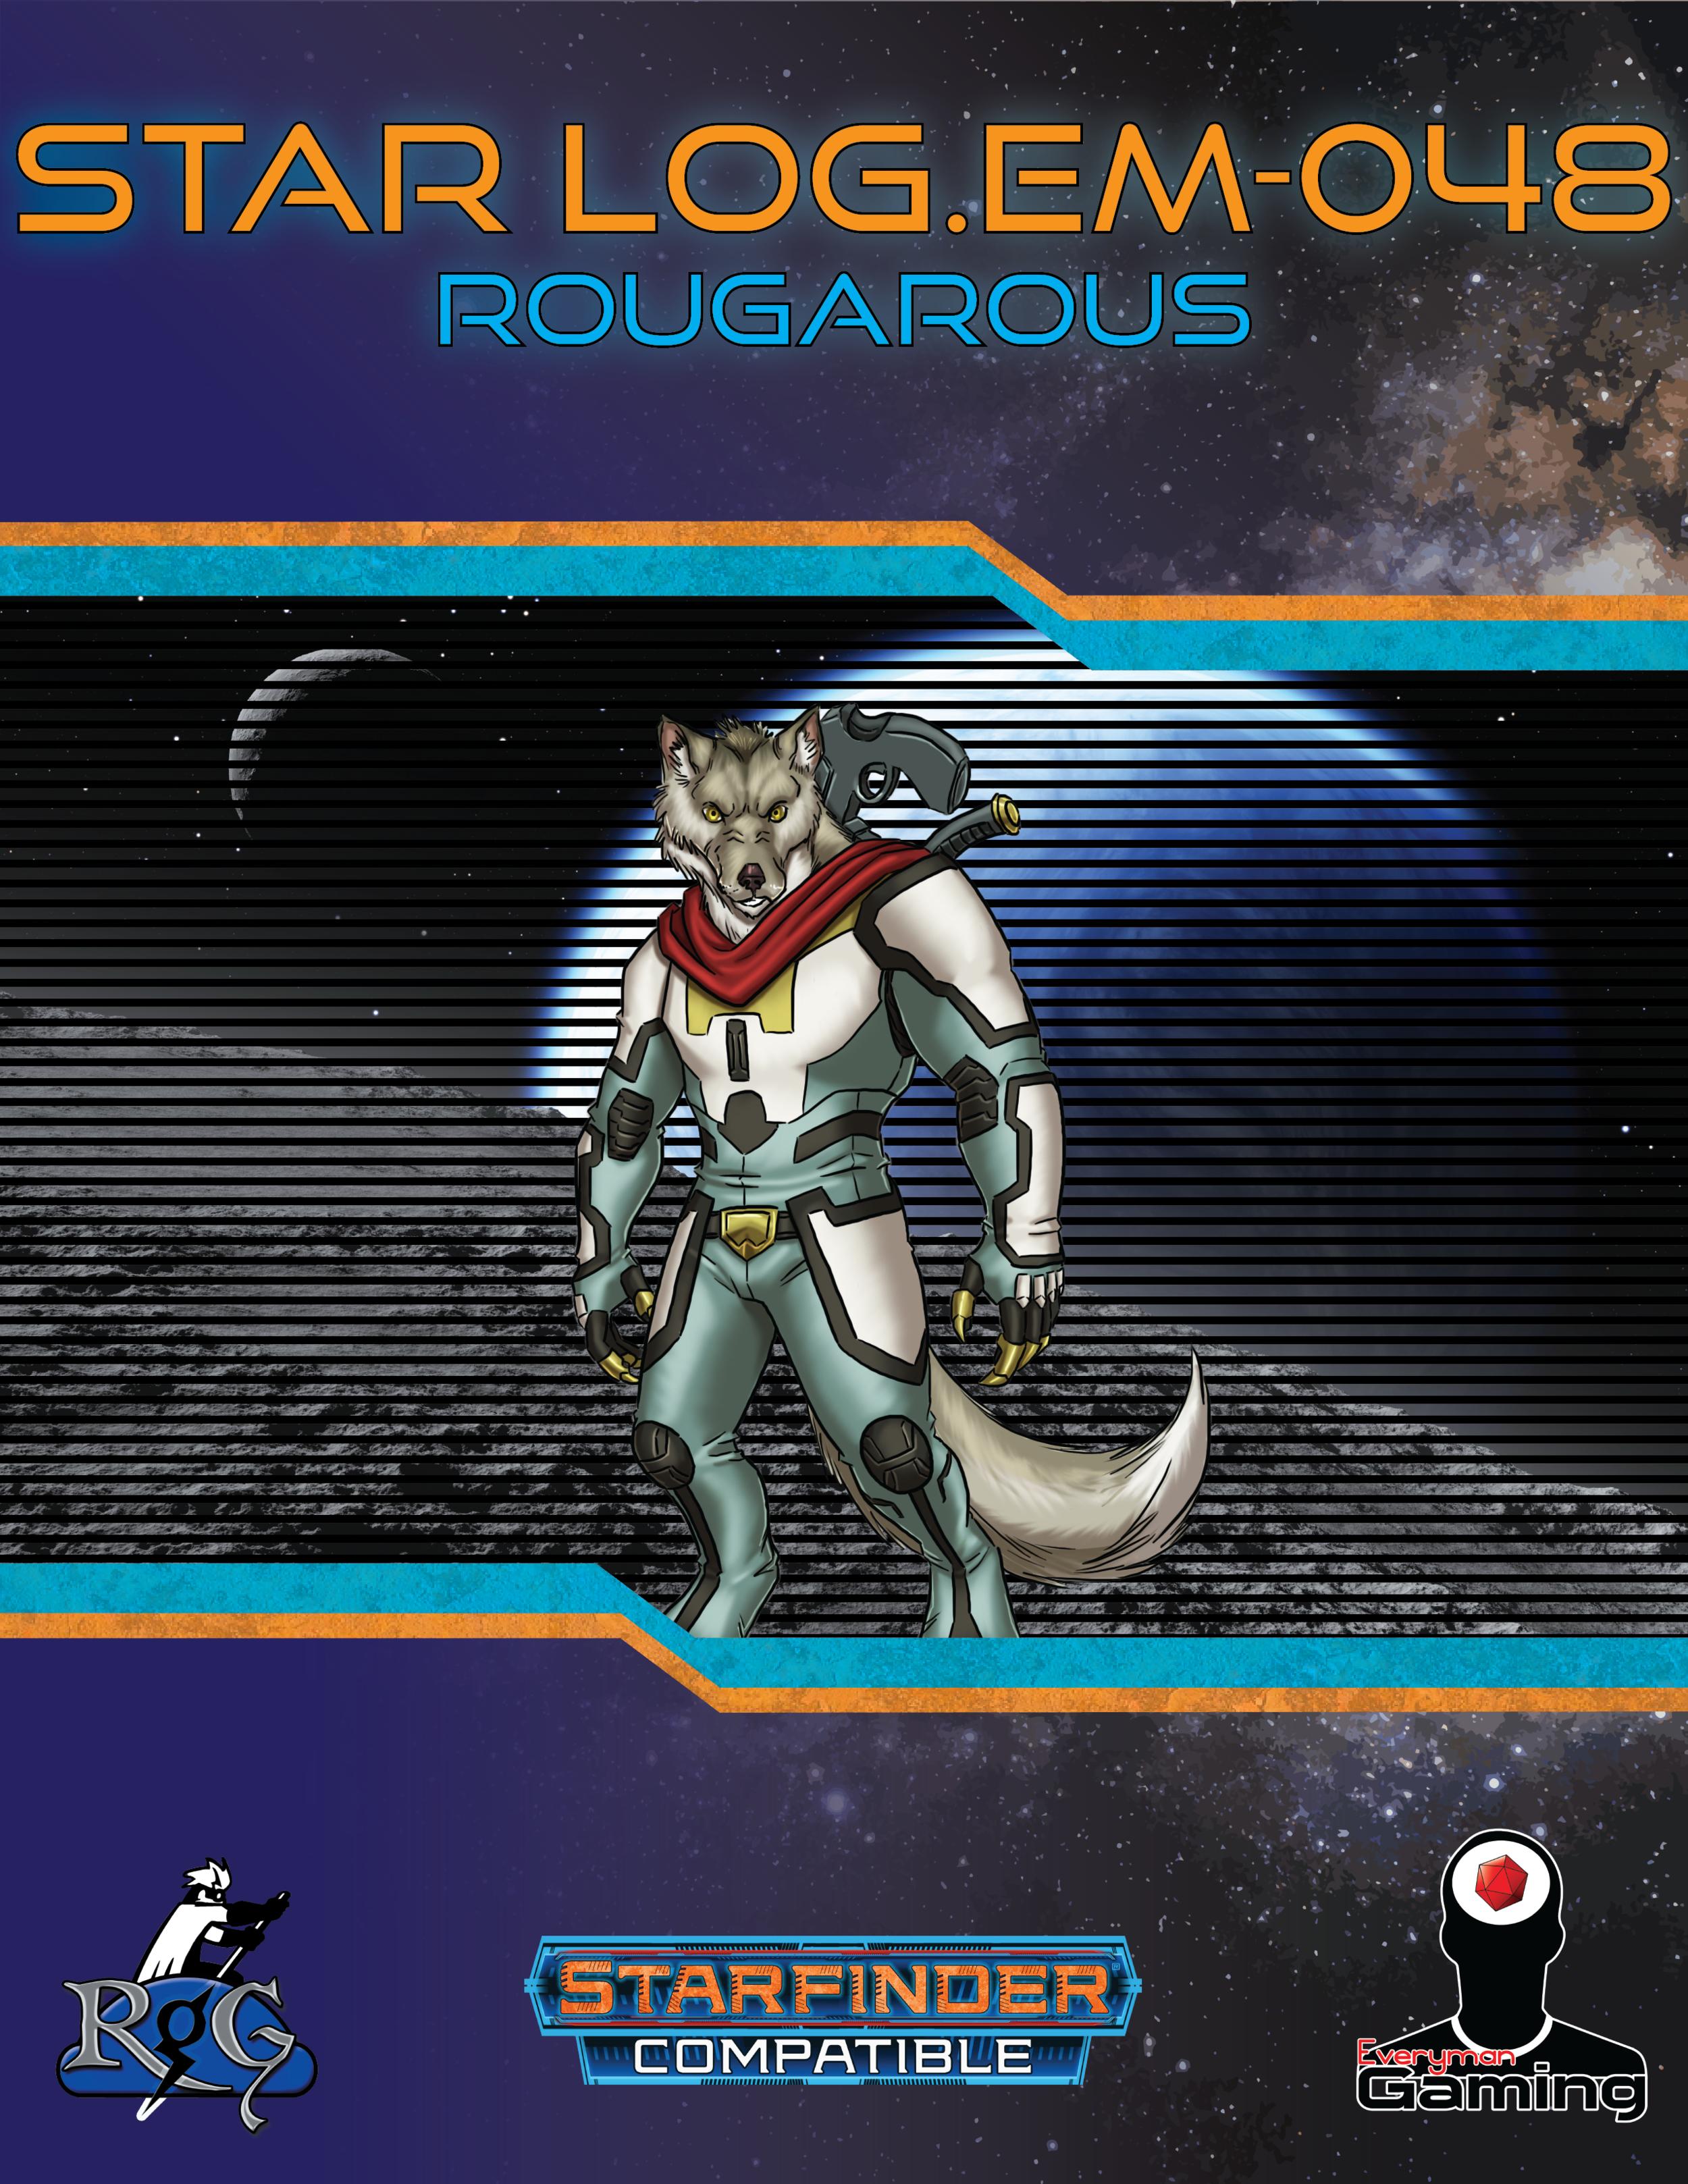 SF048 Rougarou-01.png